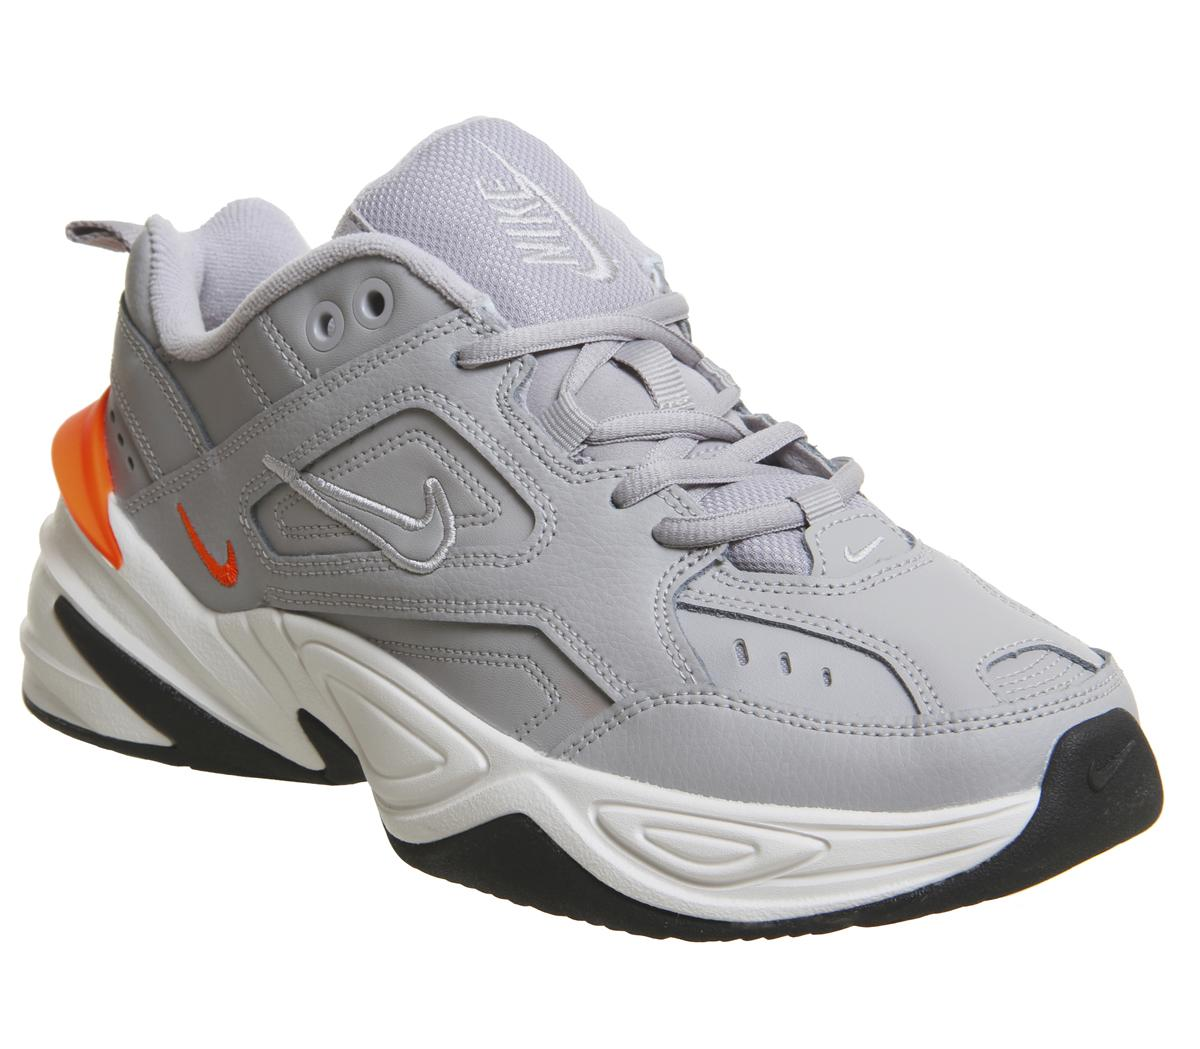 Nike M2k Tekno Trainers Atmosphere Grey